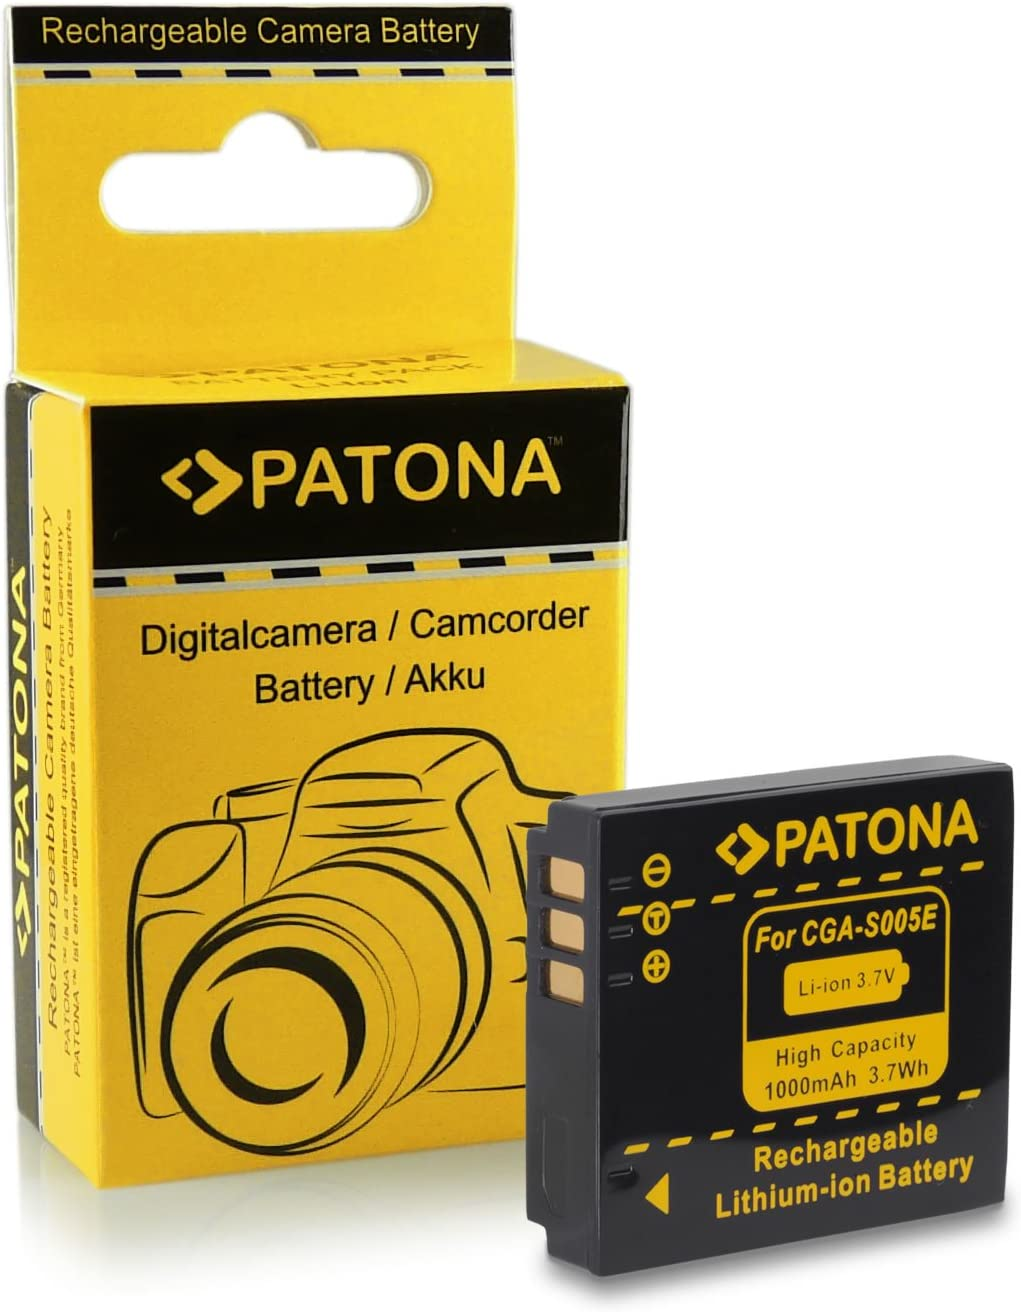 Mobiles Battery premium quality Panasonic CGA-S005 Fuji NP-70 with Infochip 100 compatible with Panasonic Lumix DMC-FX01 FX3 FX07 FX8 FX9 FX10 FX12 FX50 FX100 FX150 LX1 LX2 LX3 Fuji FinePix F20 F40 F40fd F47